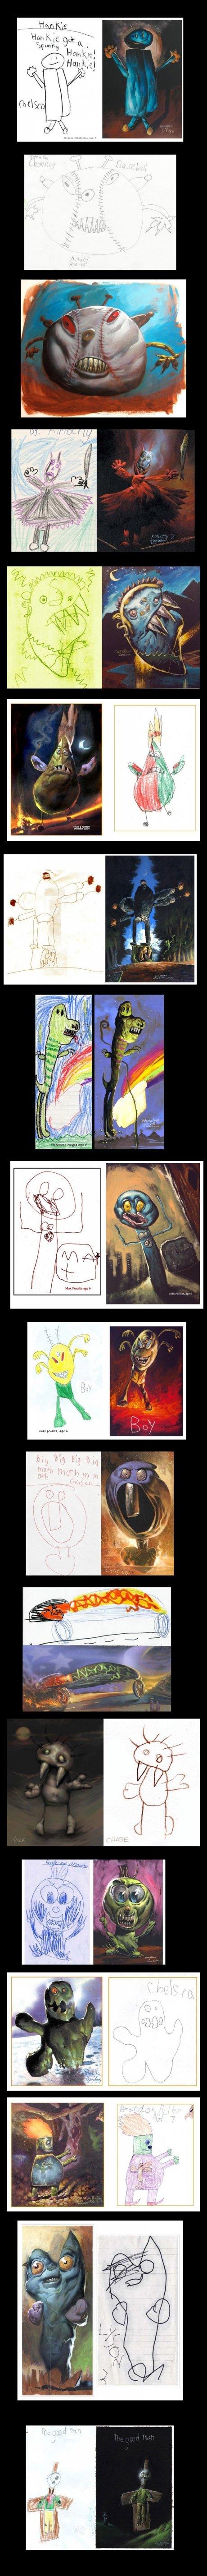 Nightmare Drawings. .. Who you callin' pinhead?